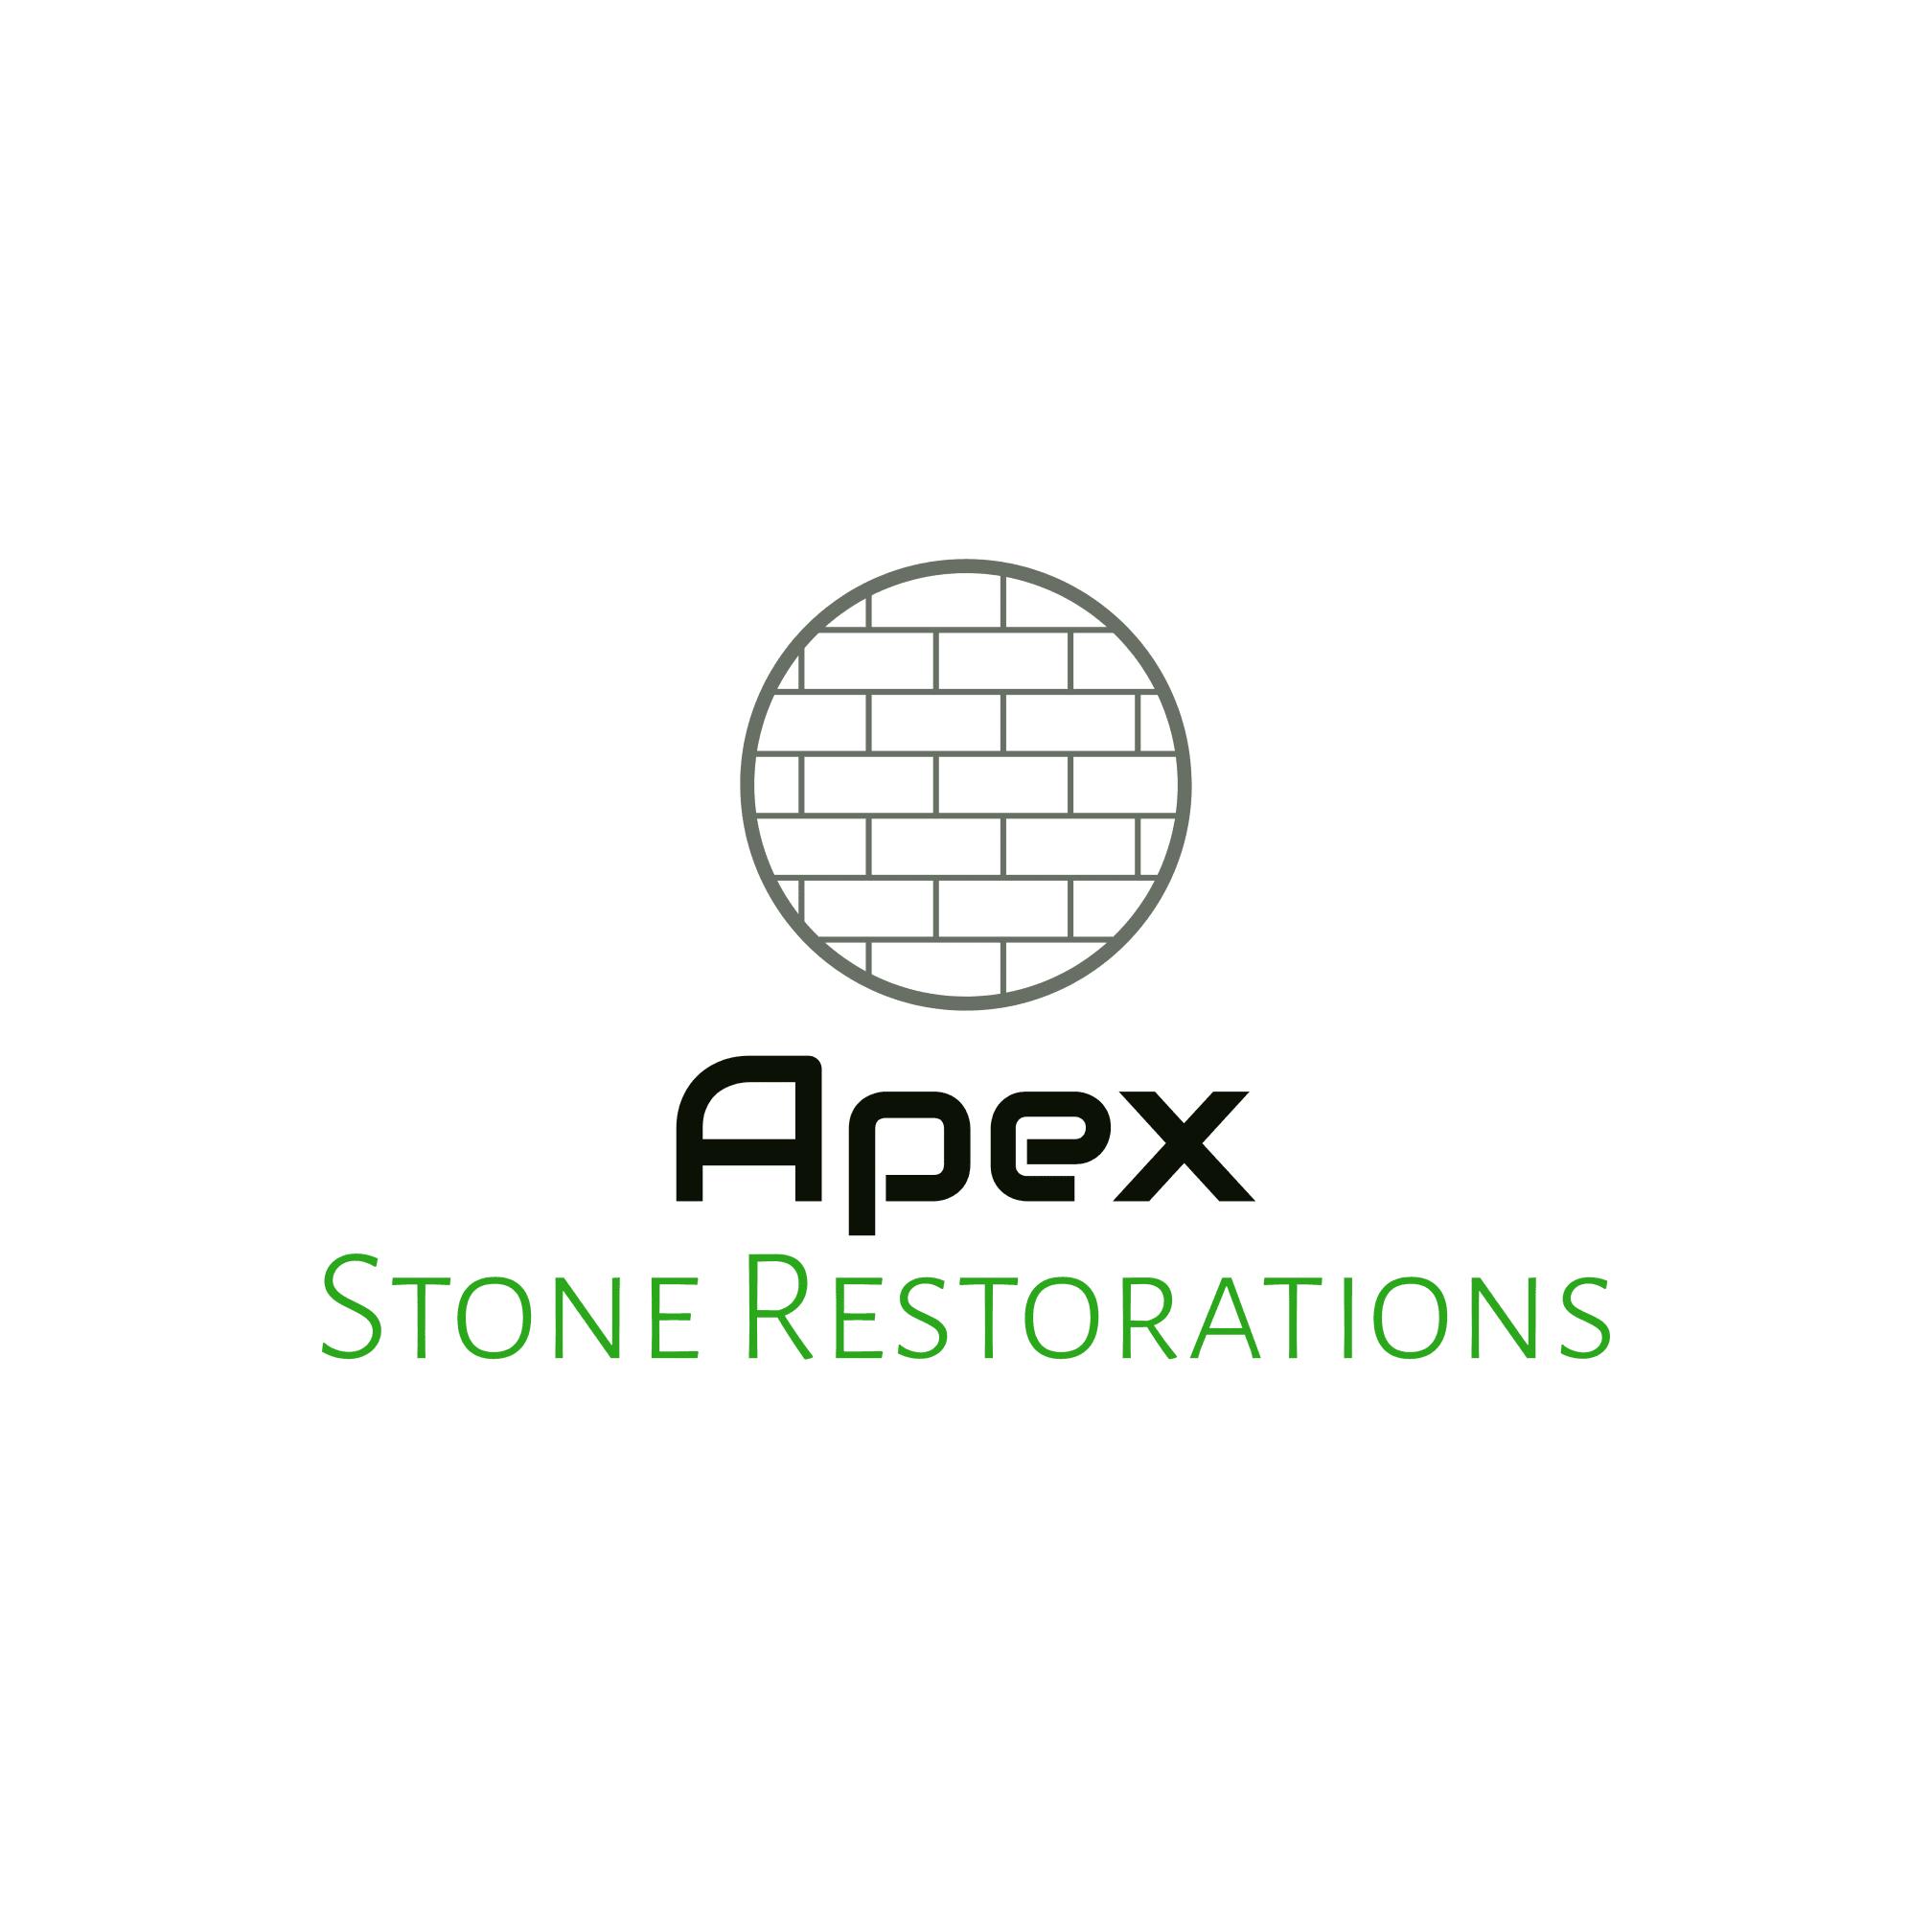 Apex Stone Restorations - Yeovil, Somerset  - 07710 610167 | ShowMeLocal.com